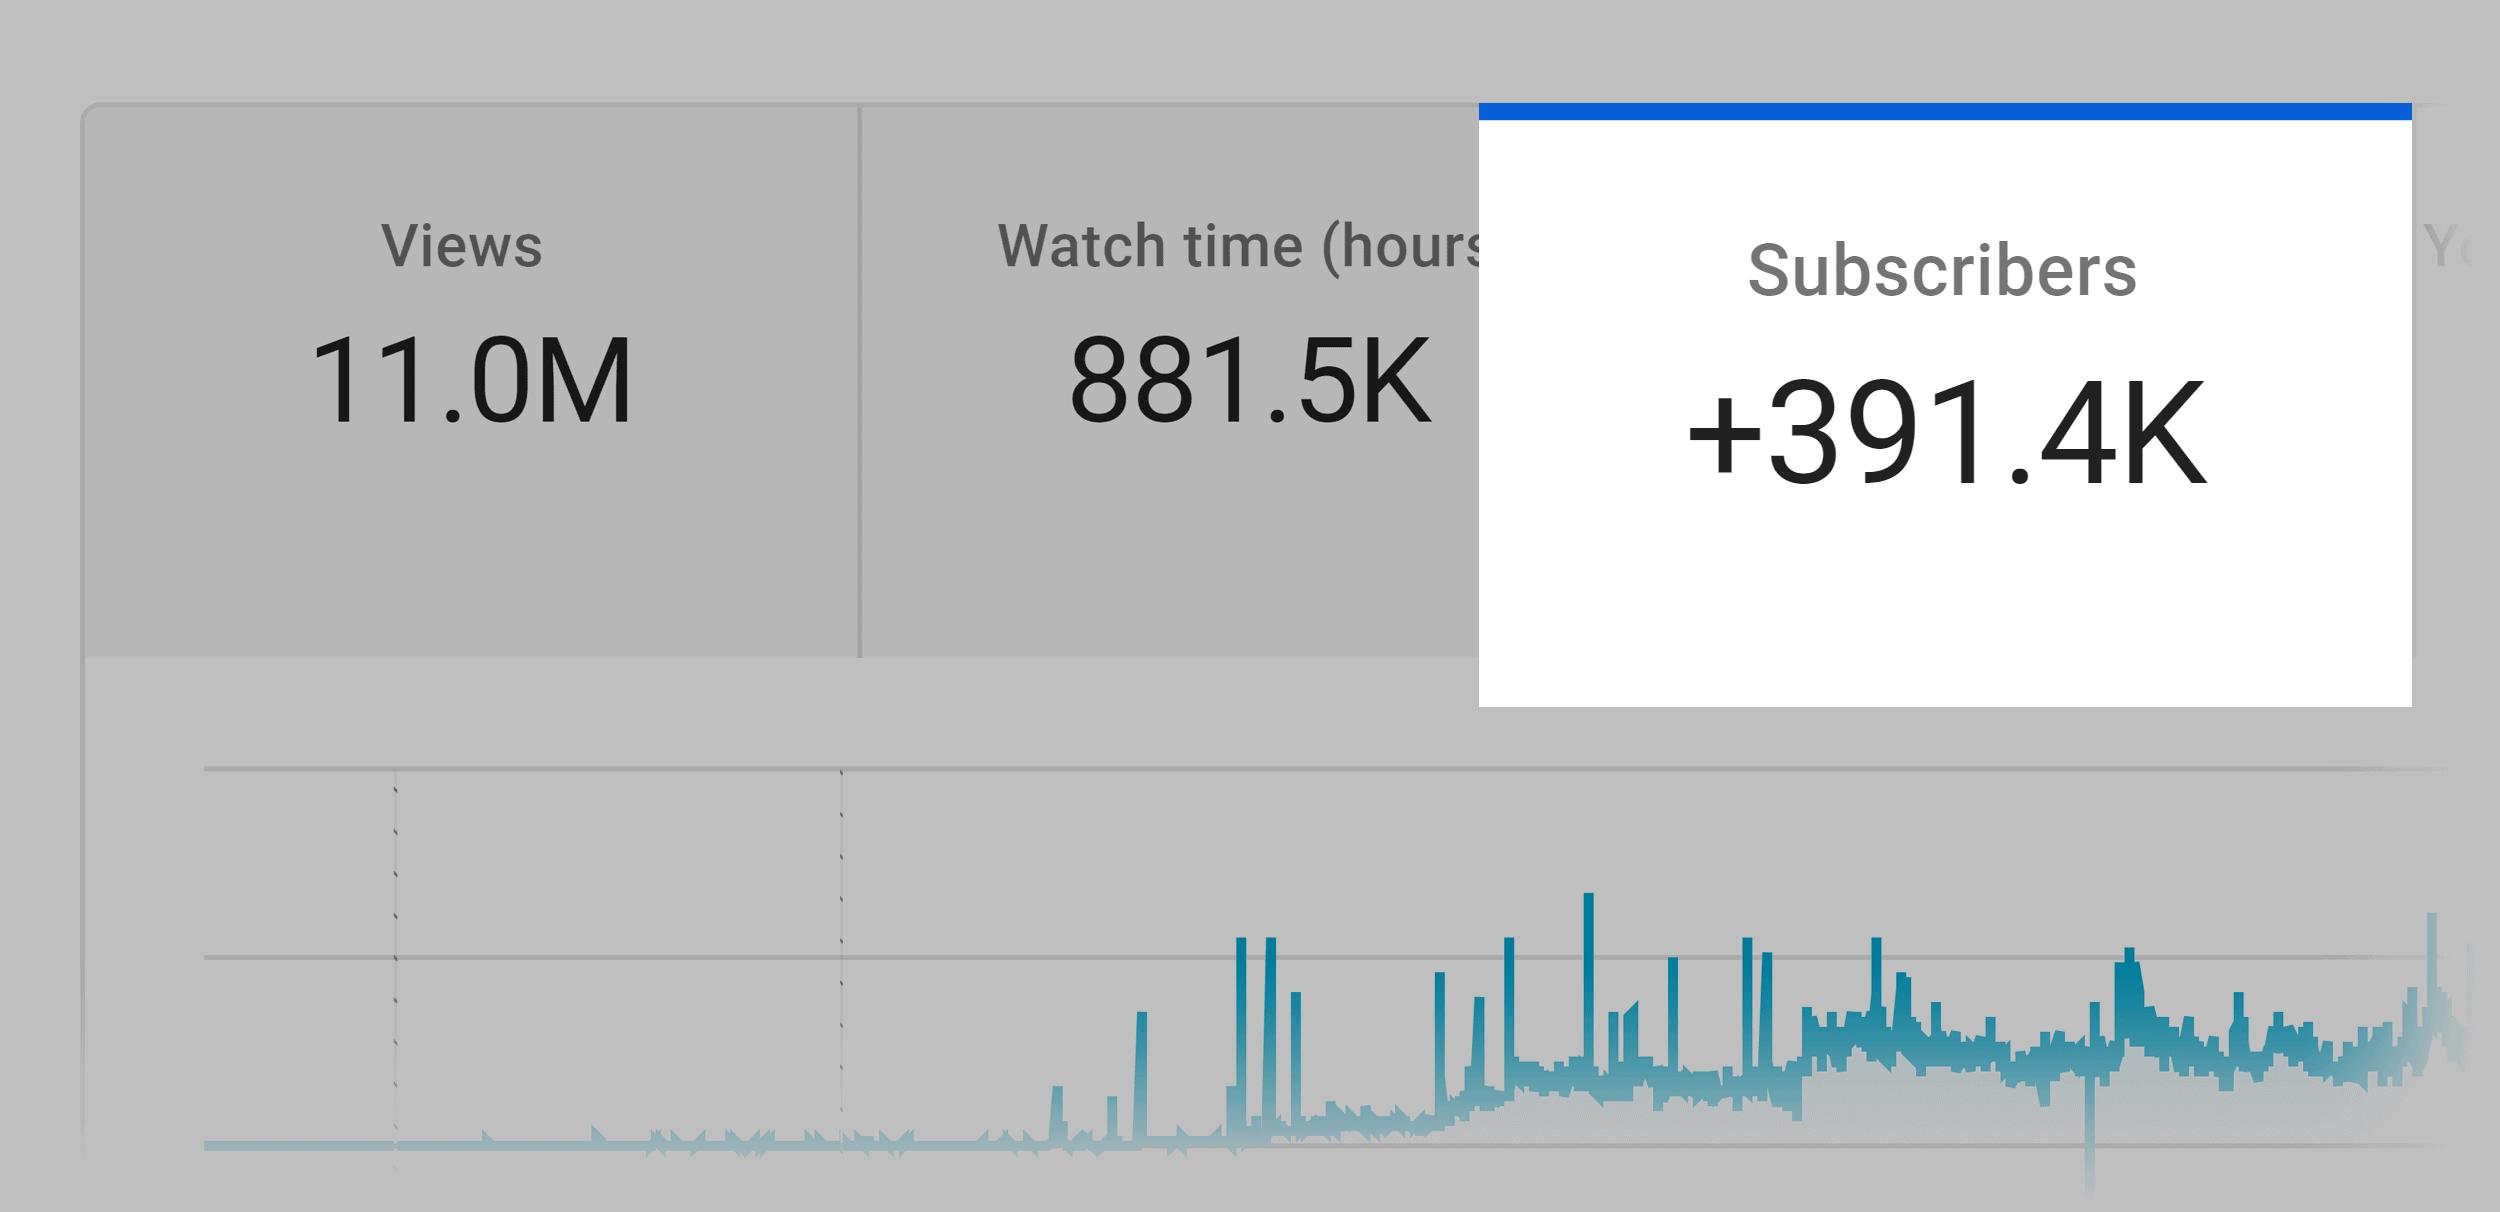 Backlinko – YouTube channel subscribers